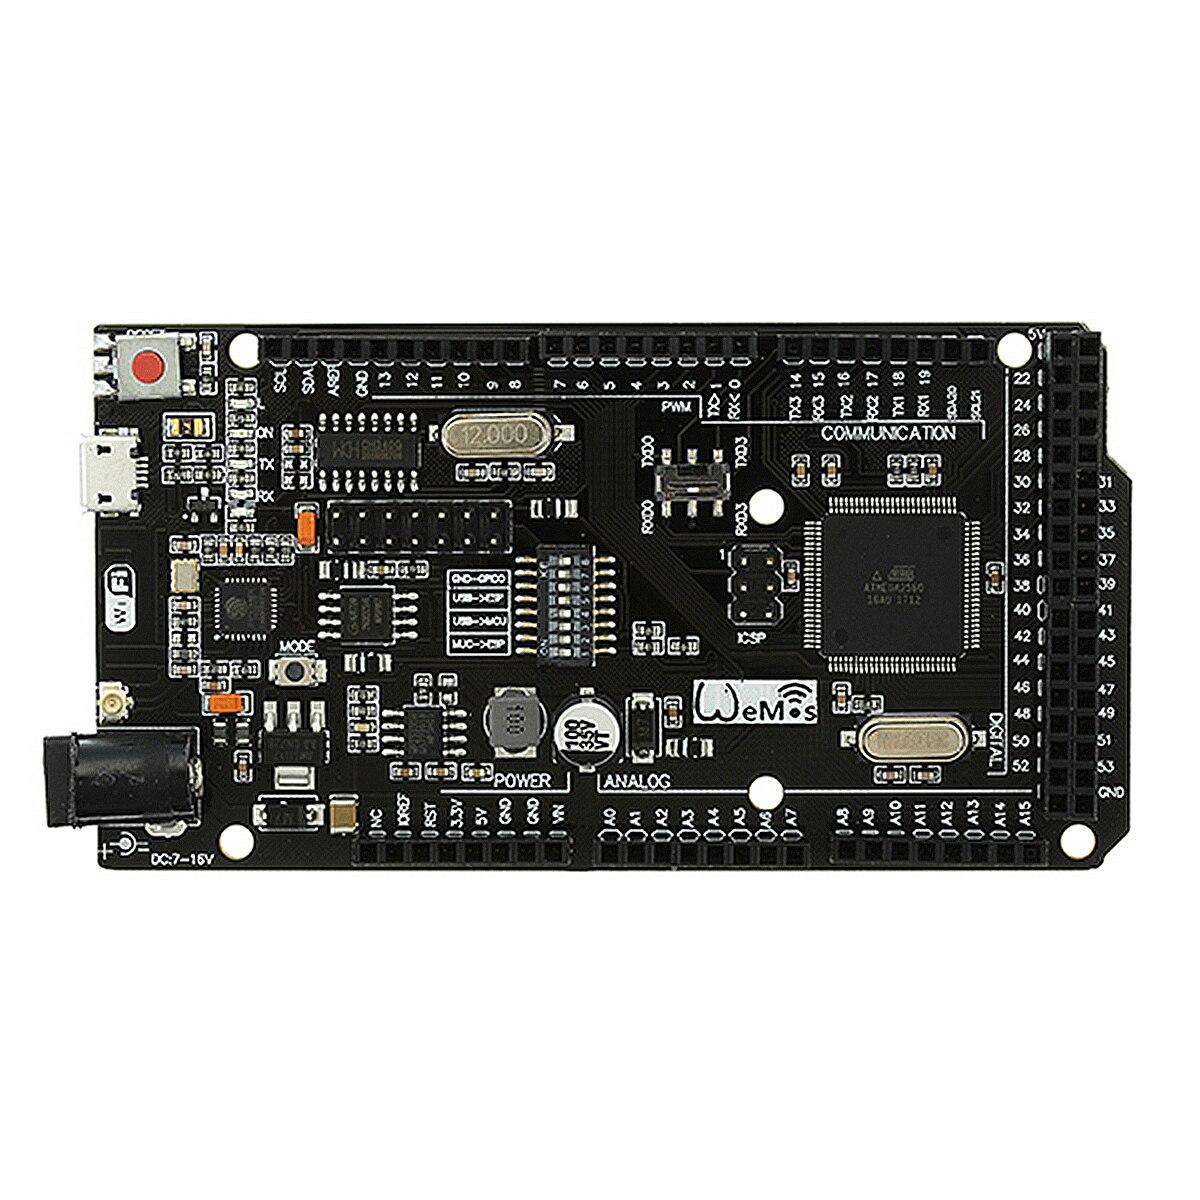 NEUE Mega + WiFi R3 ATmega2560 + ESP8266 32 mt Speicher USB-TTL CH340G Kompatibel Für Arduino Mega NodeMCU ESP8266